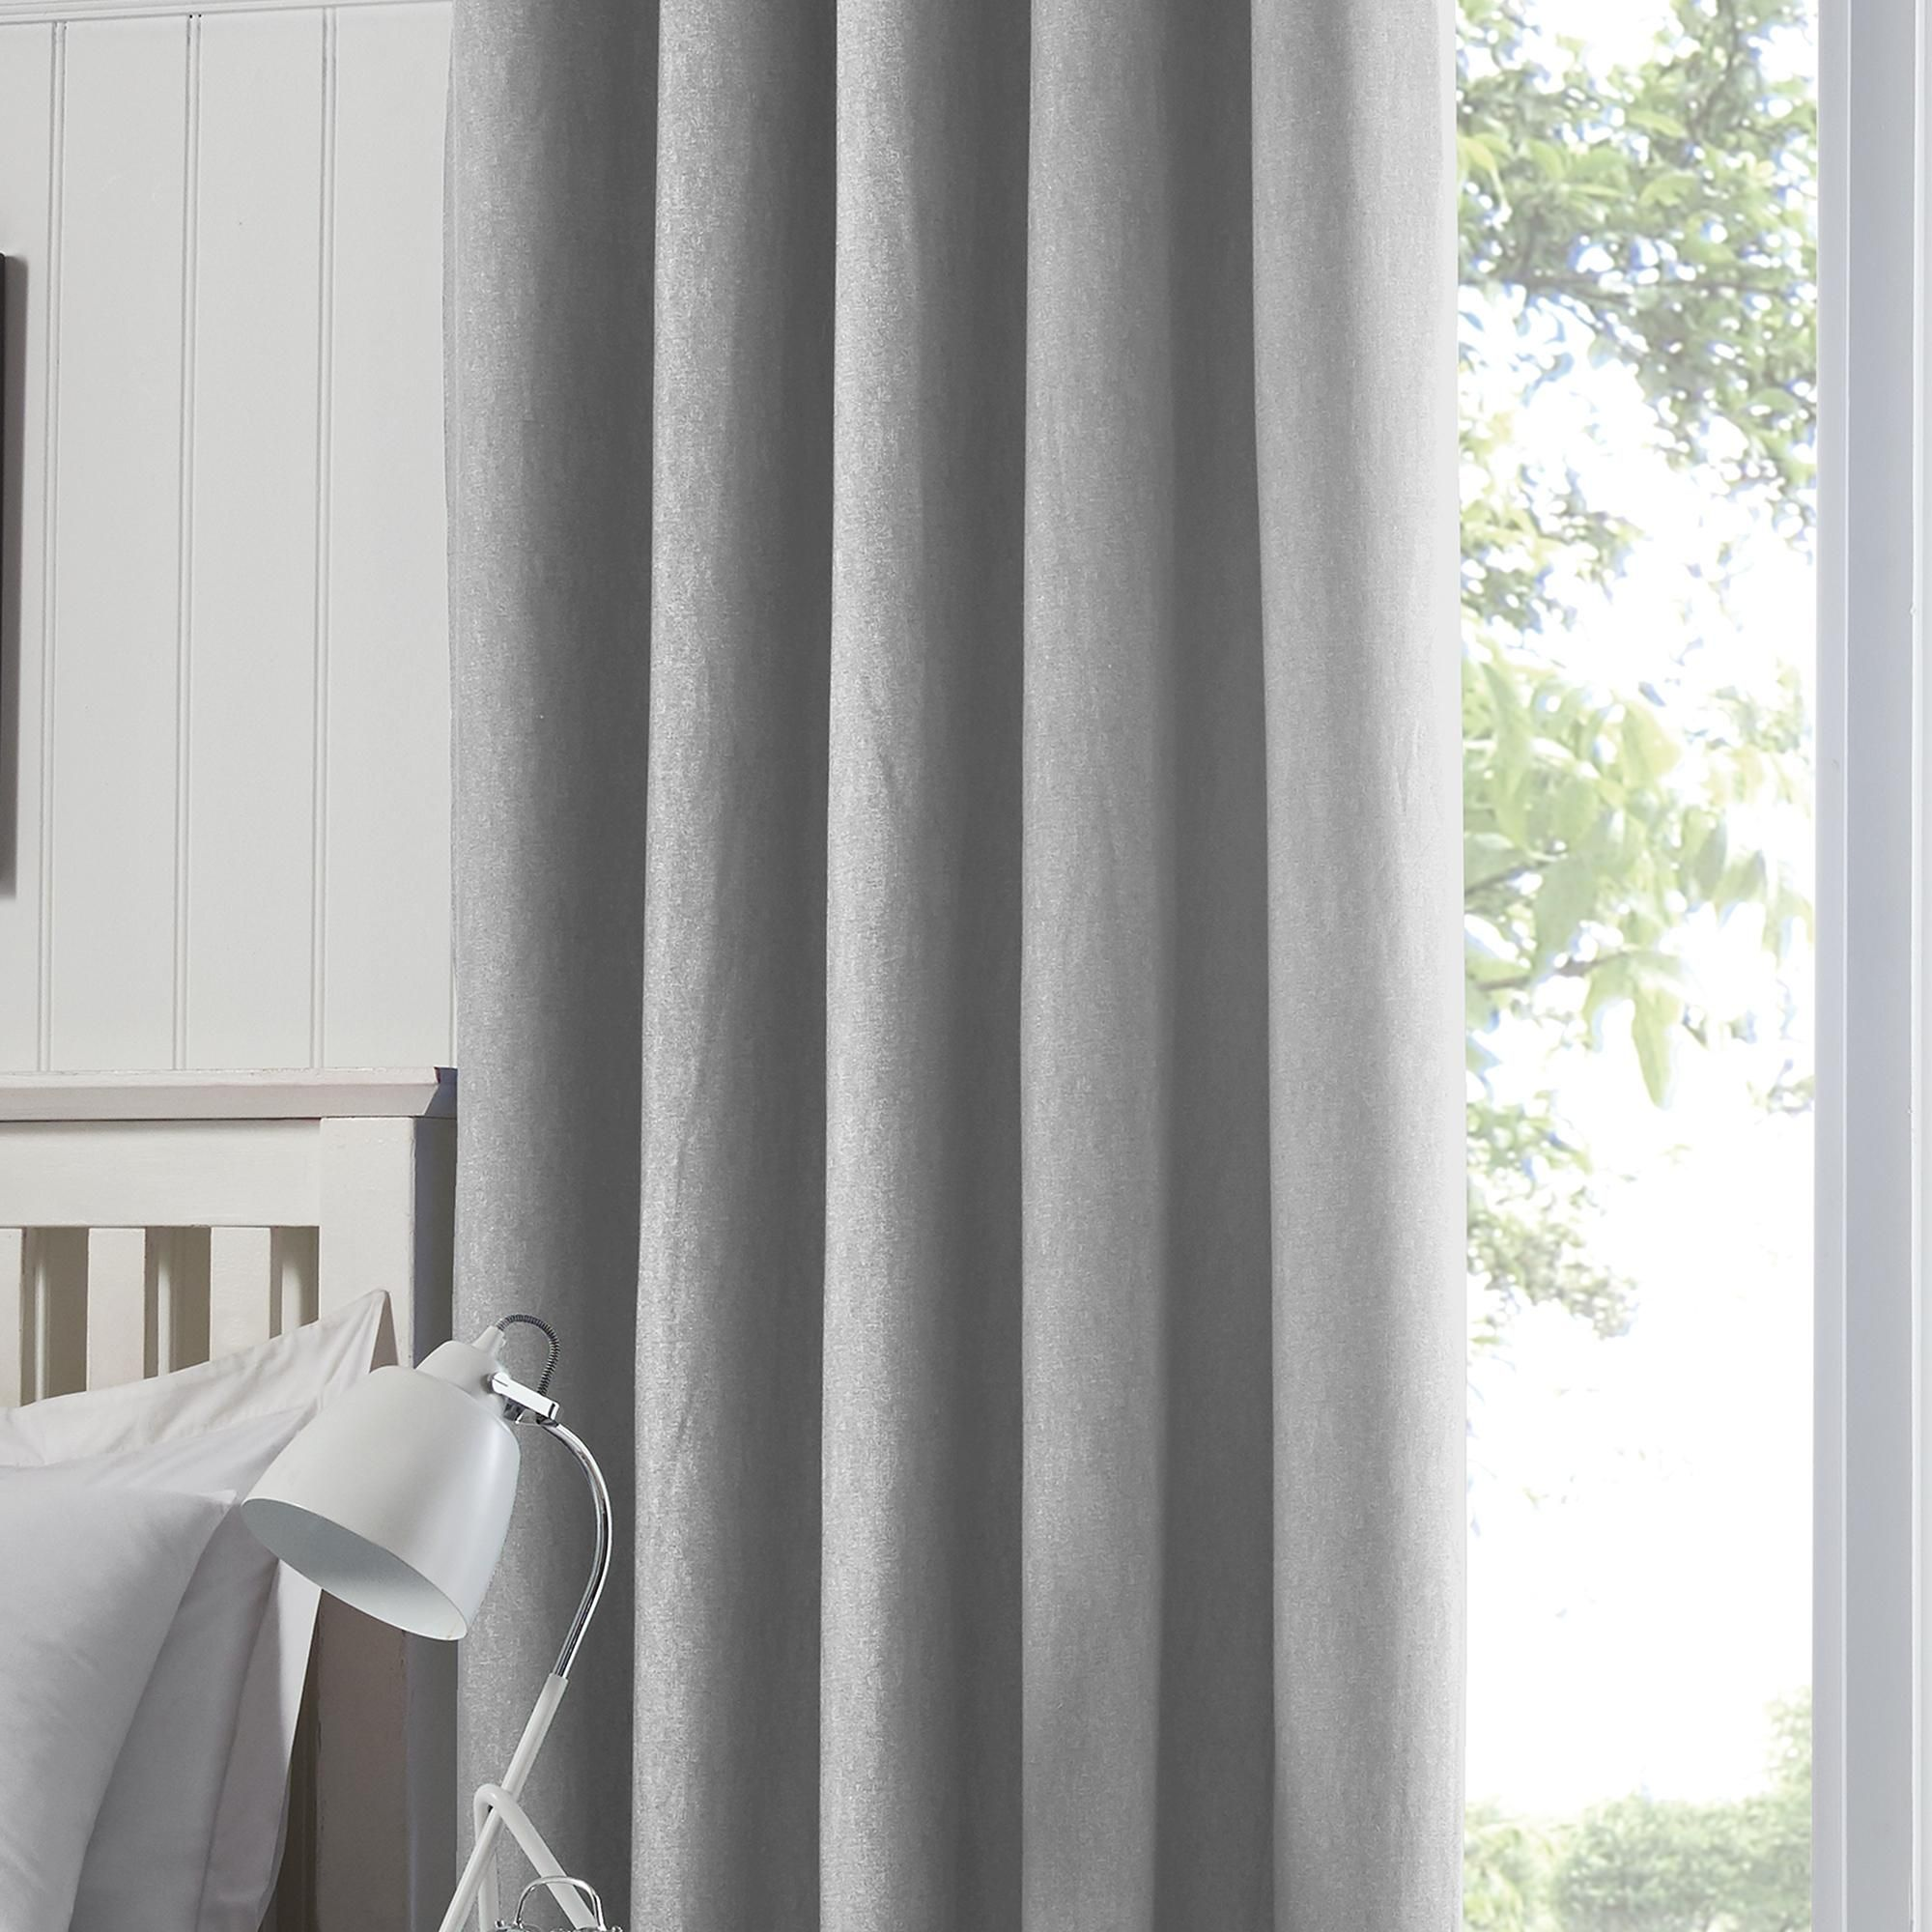 Argos Home 117 x 183cm Blackout Eyelet Curtains Blush